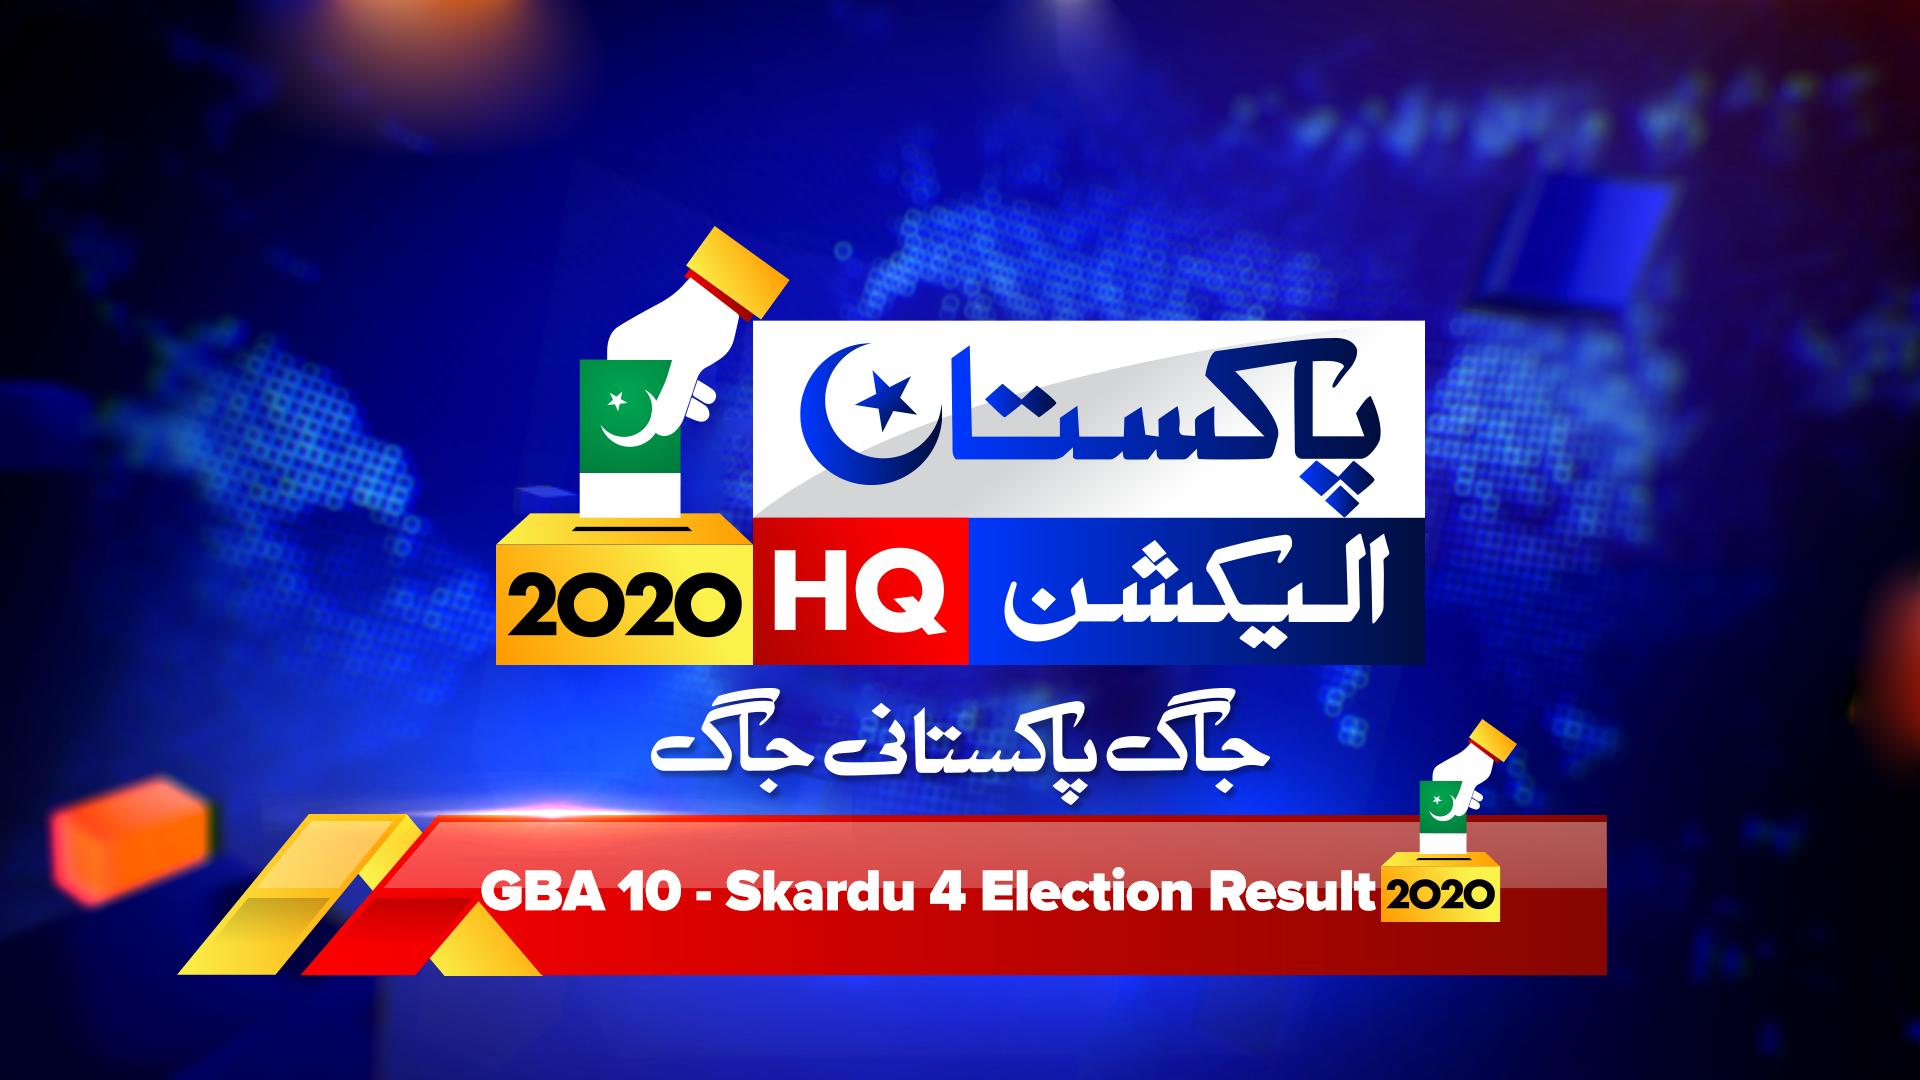 GBA 10 Gilgit 10 Election Result